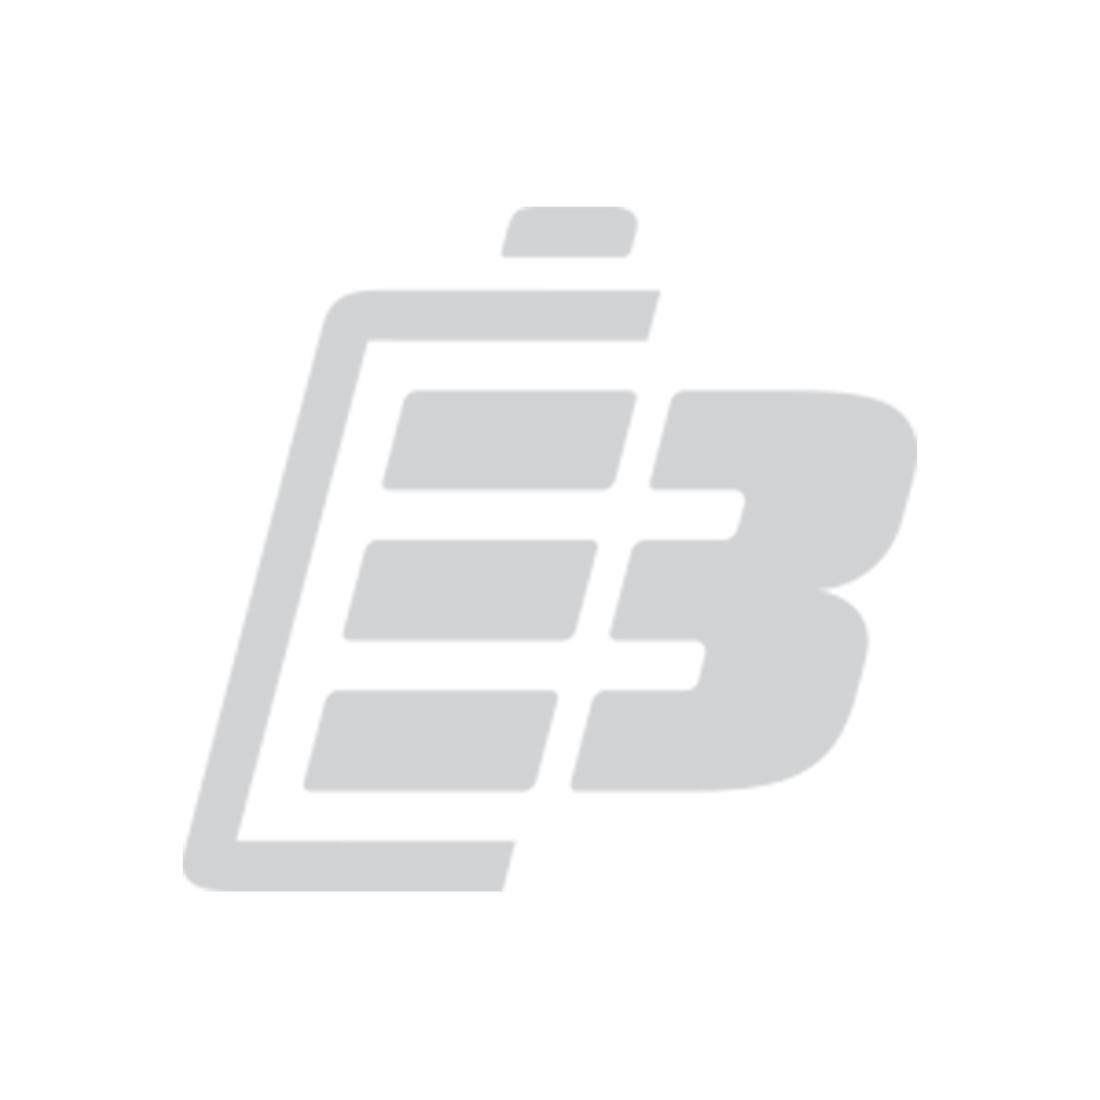 Two-Way radio battery Motorola Talkabout T5300_1